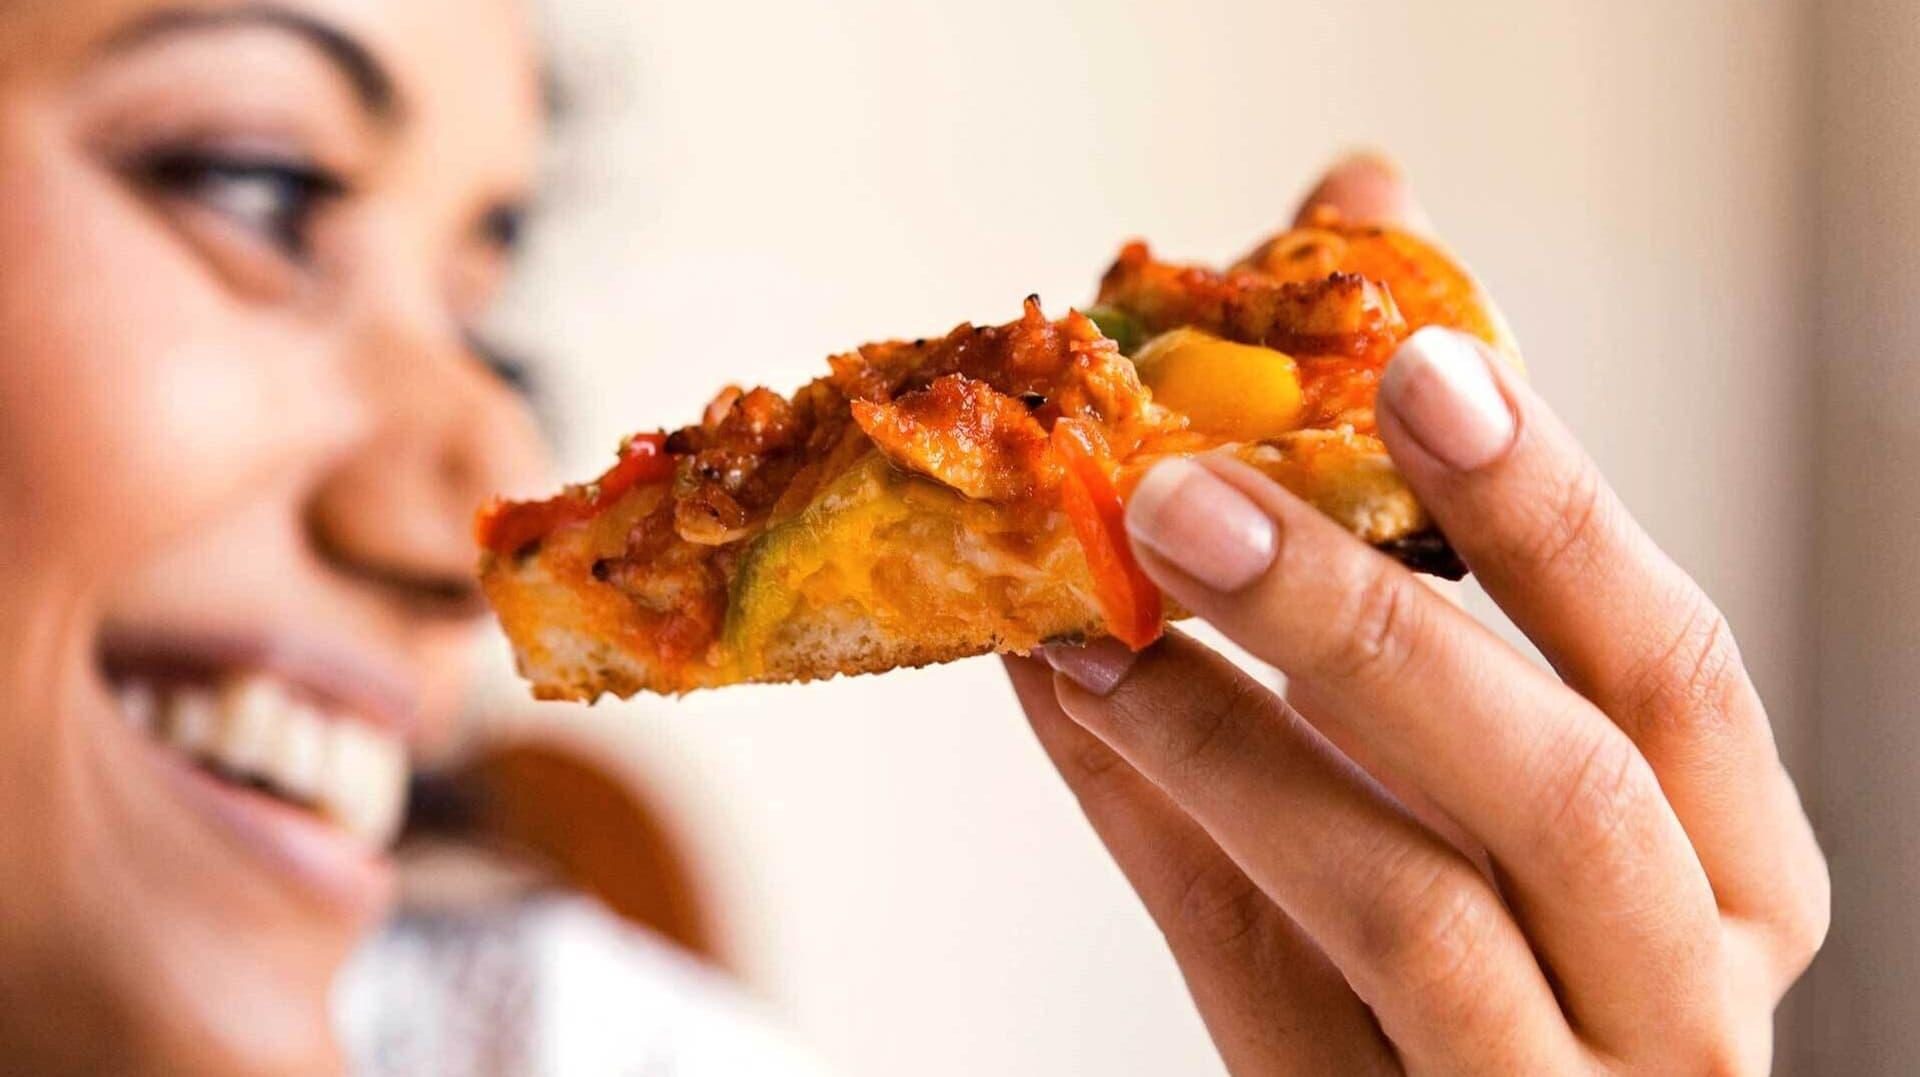 Frau mit Pizza